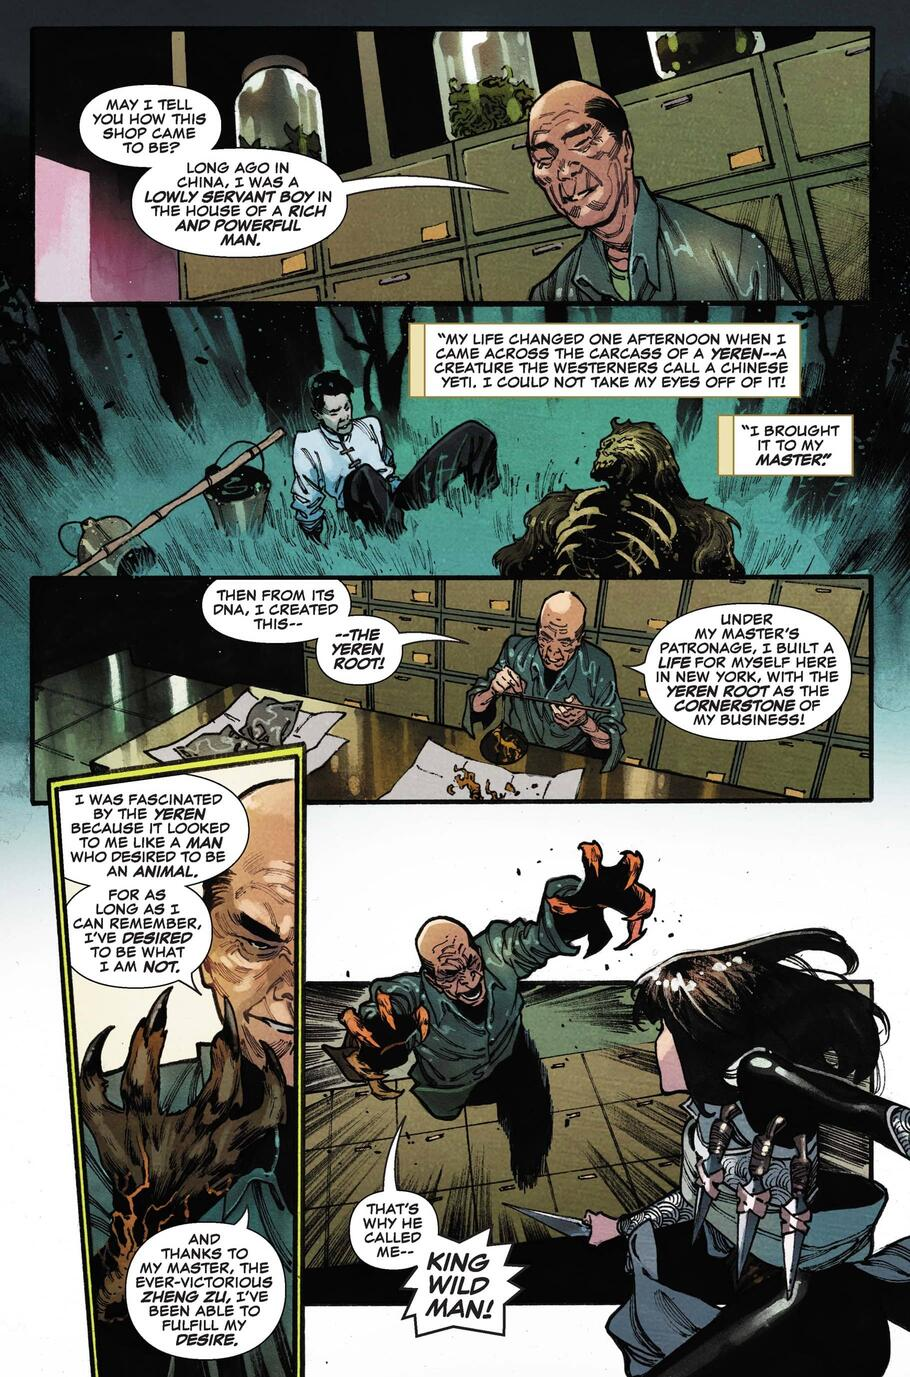 The origin of King Wild Man.